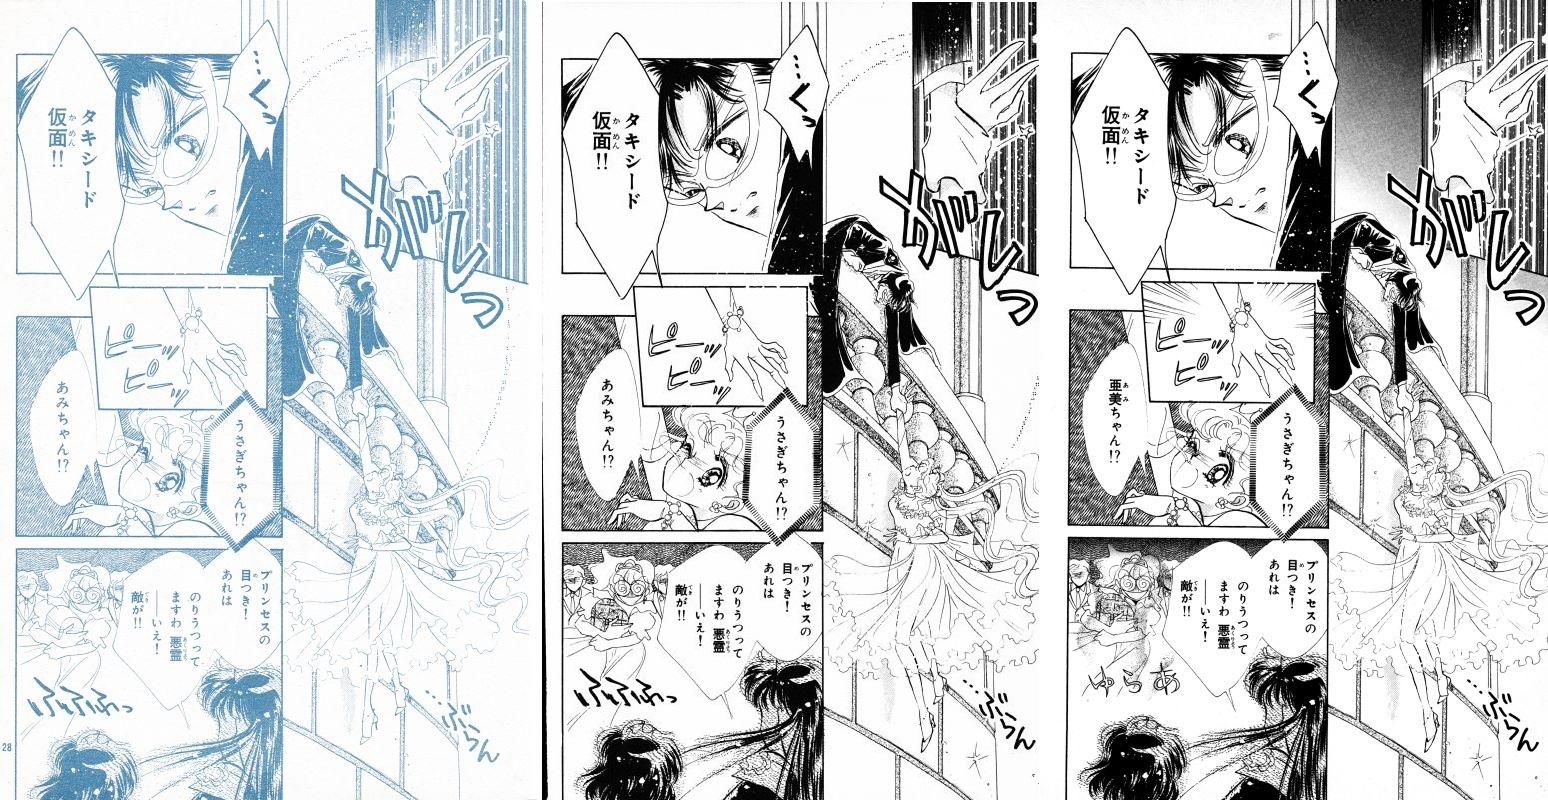 Act 4, Page 25 – Nakayoshi, Original, Remaster